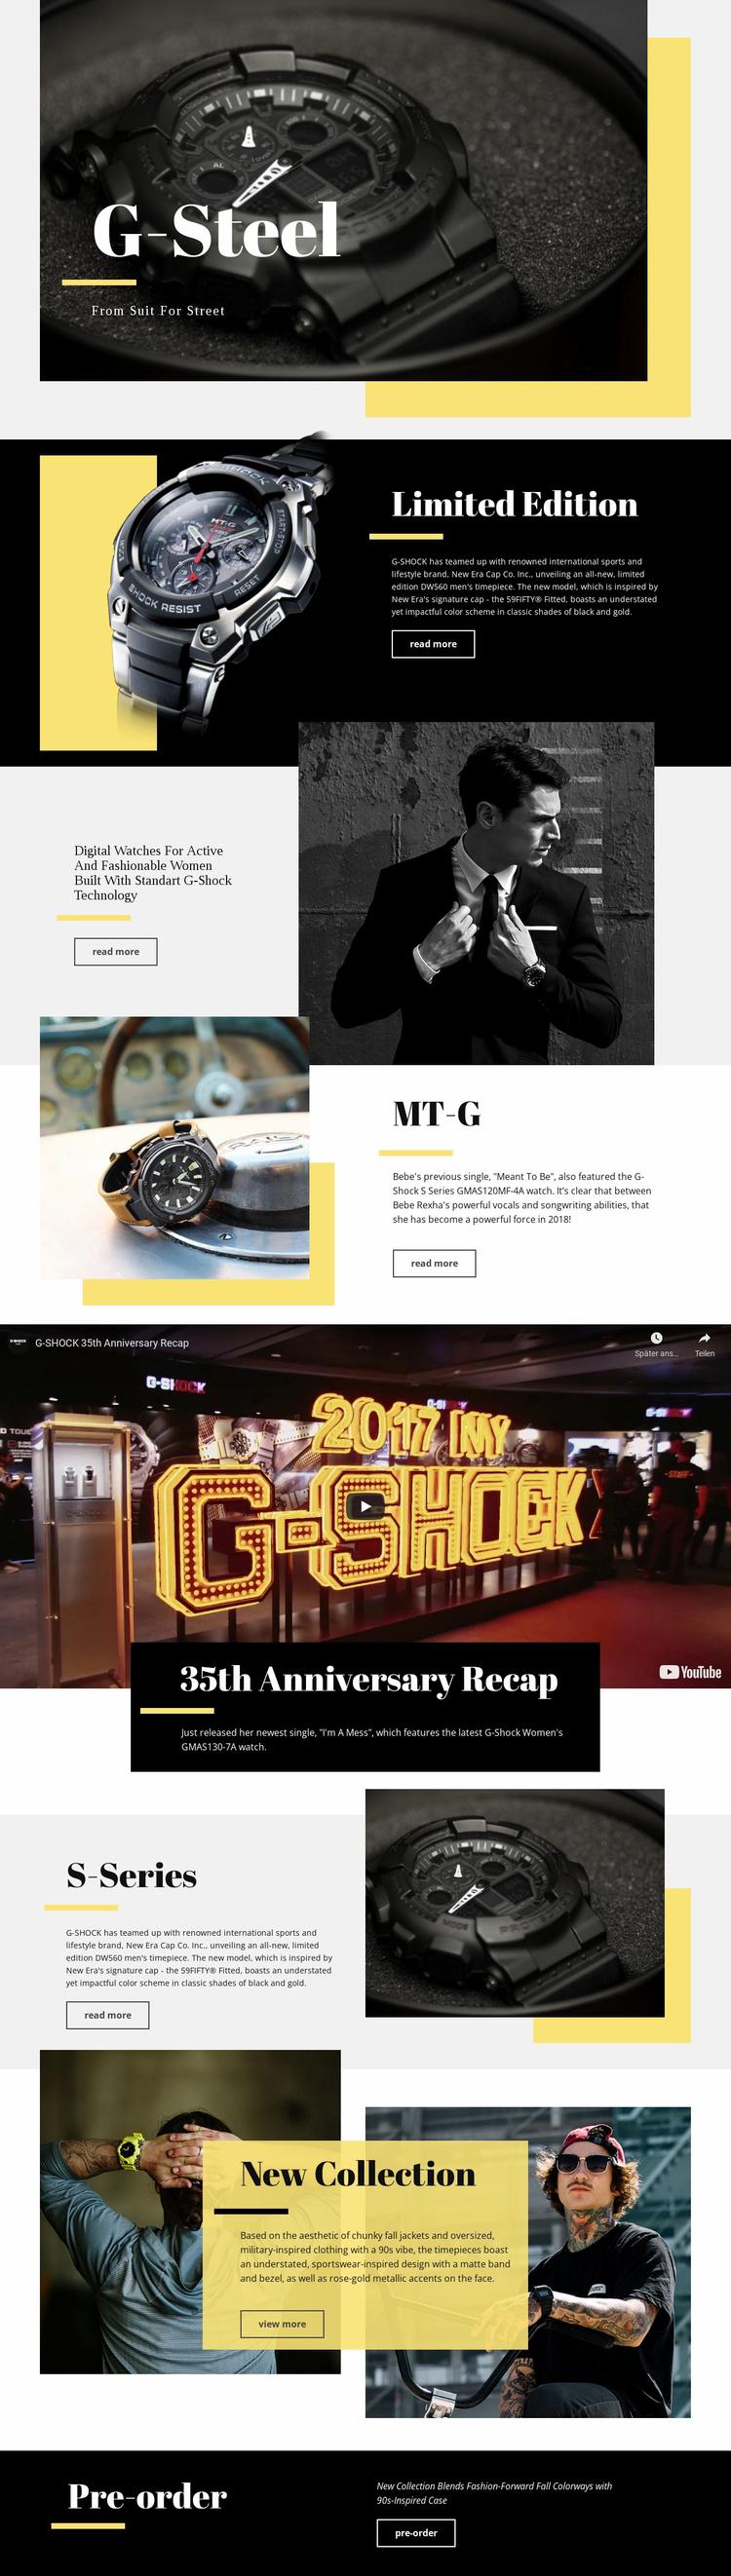 G-Steel Website Template